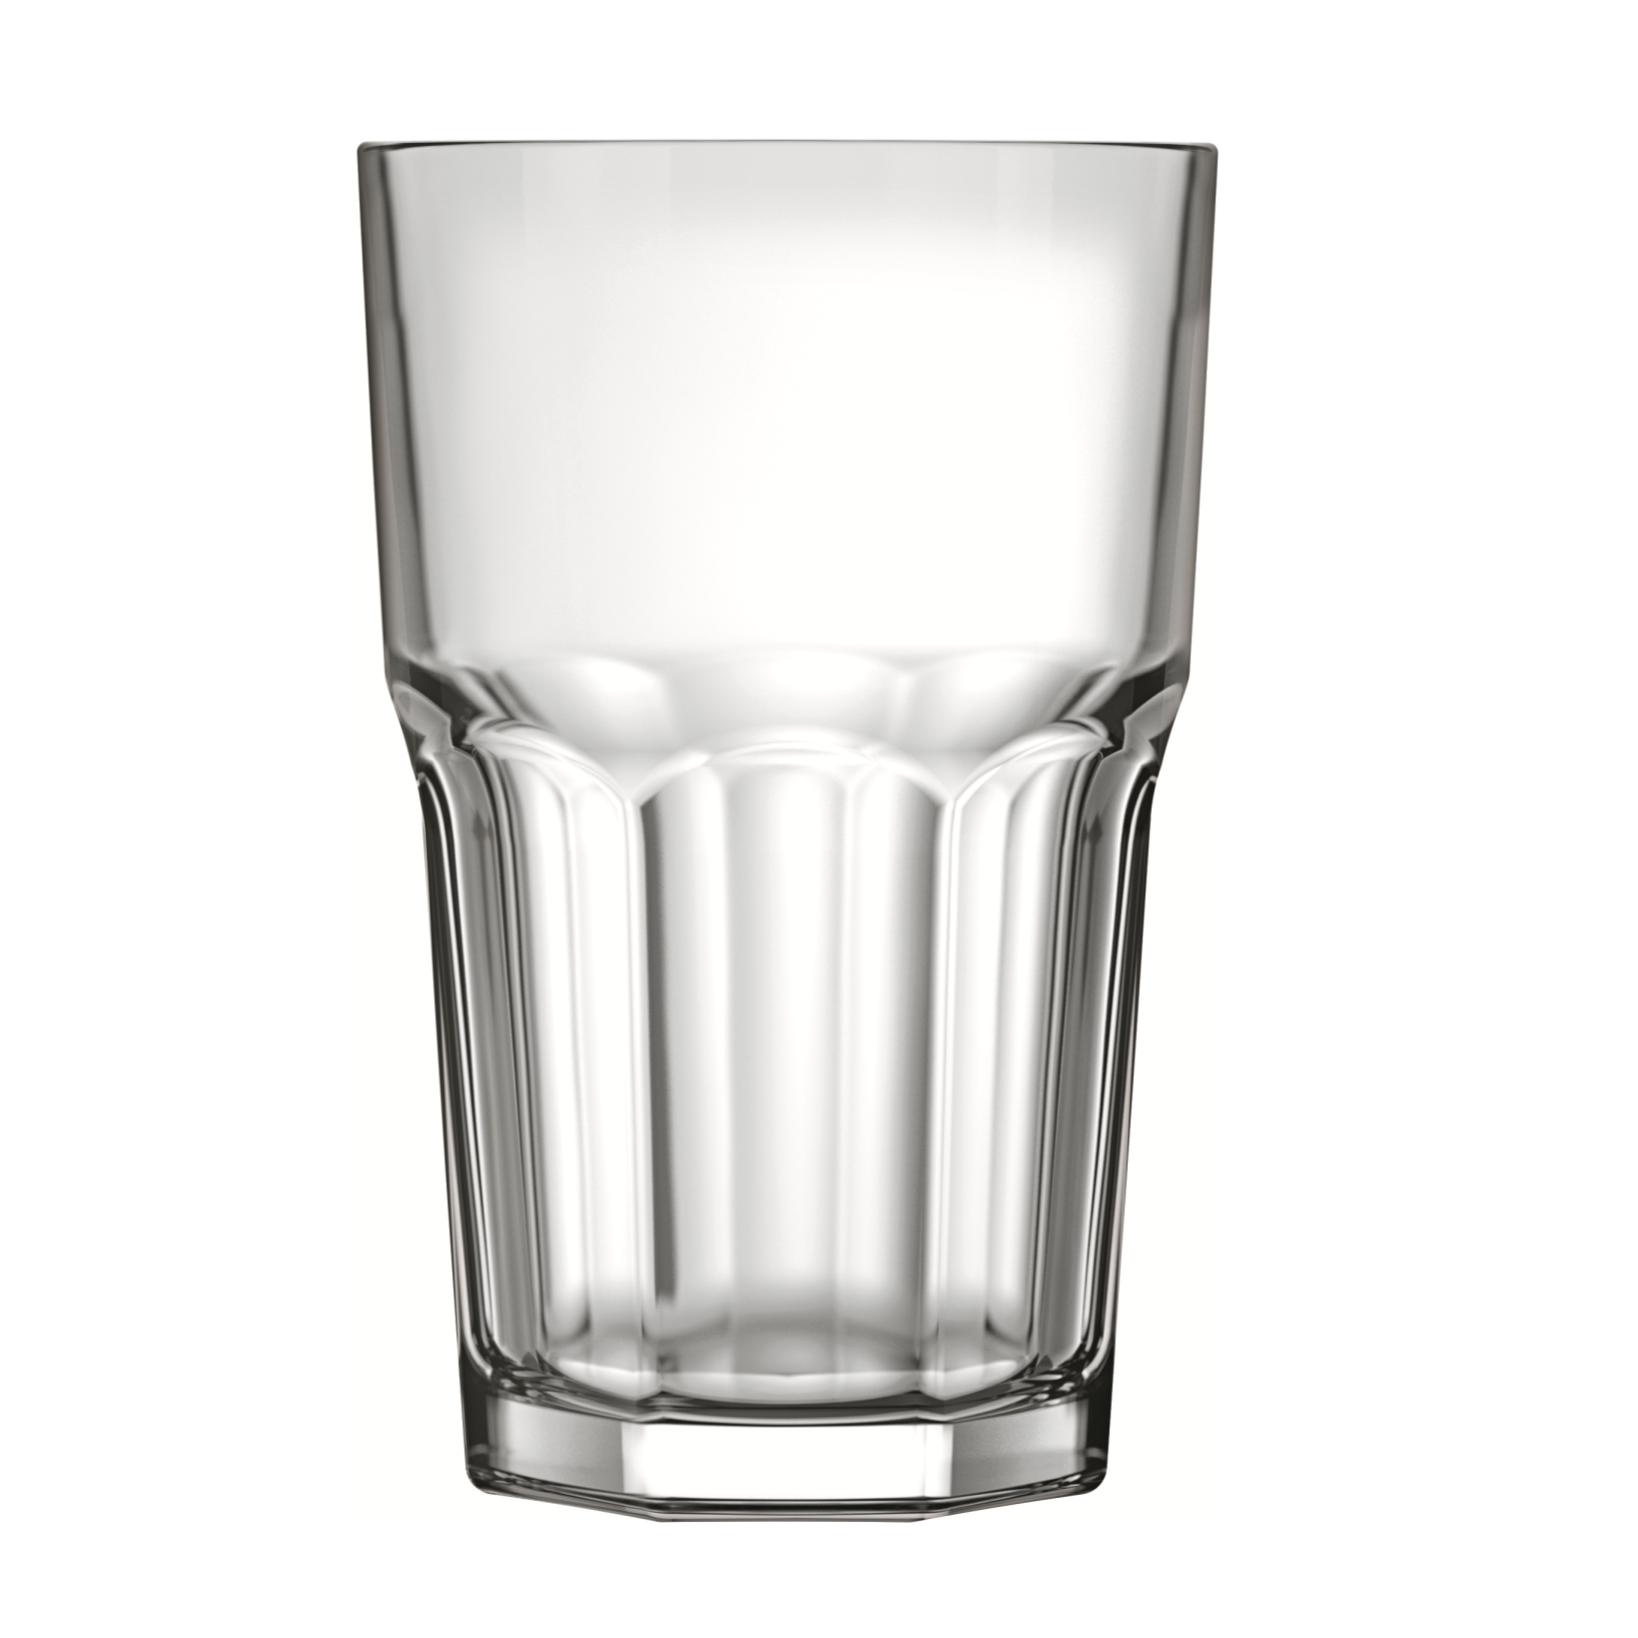 Copo de Suco de Vidro 520ml Transparente - Bristol Nadir